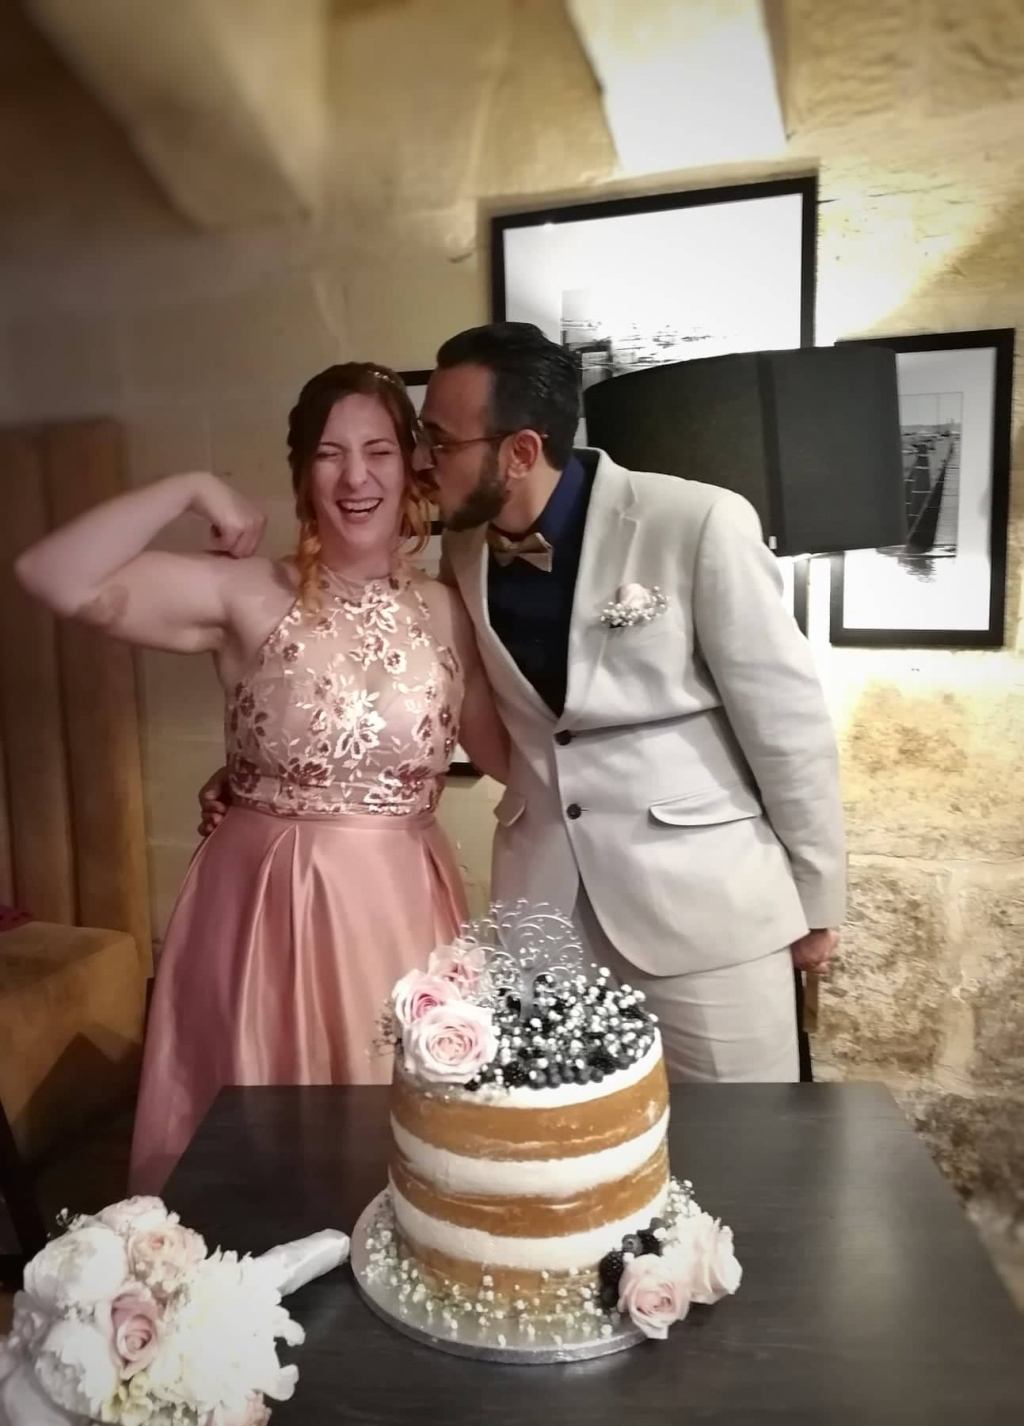 Cake & Love